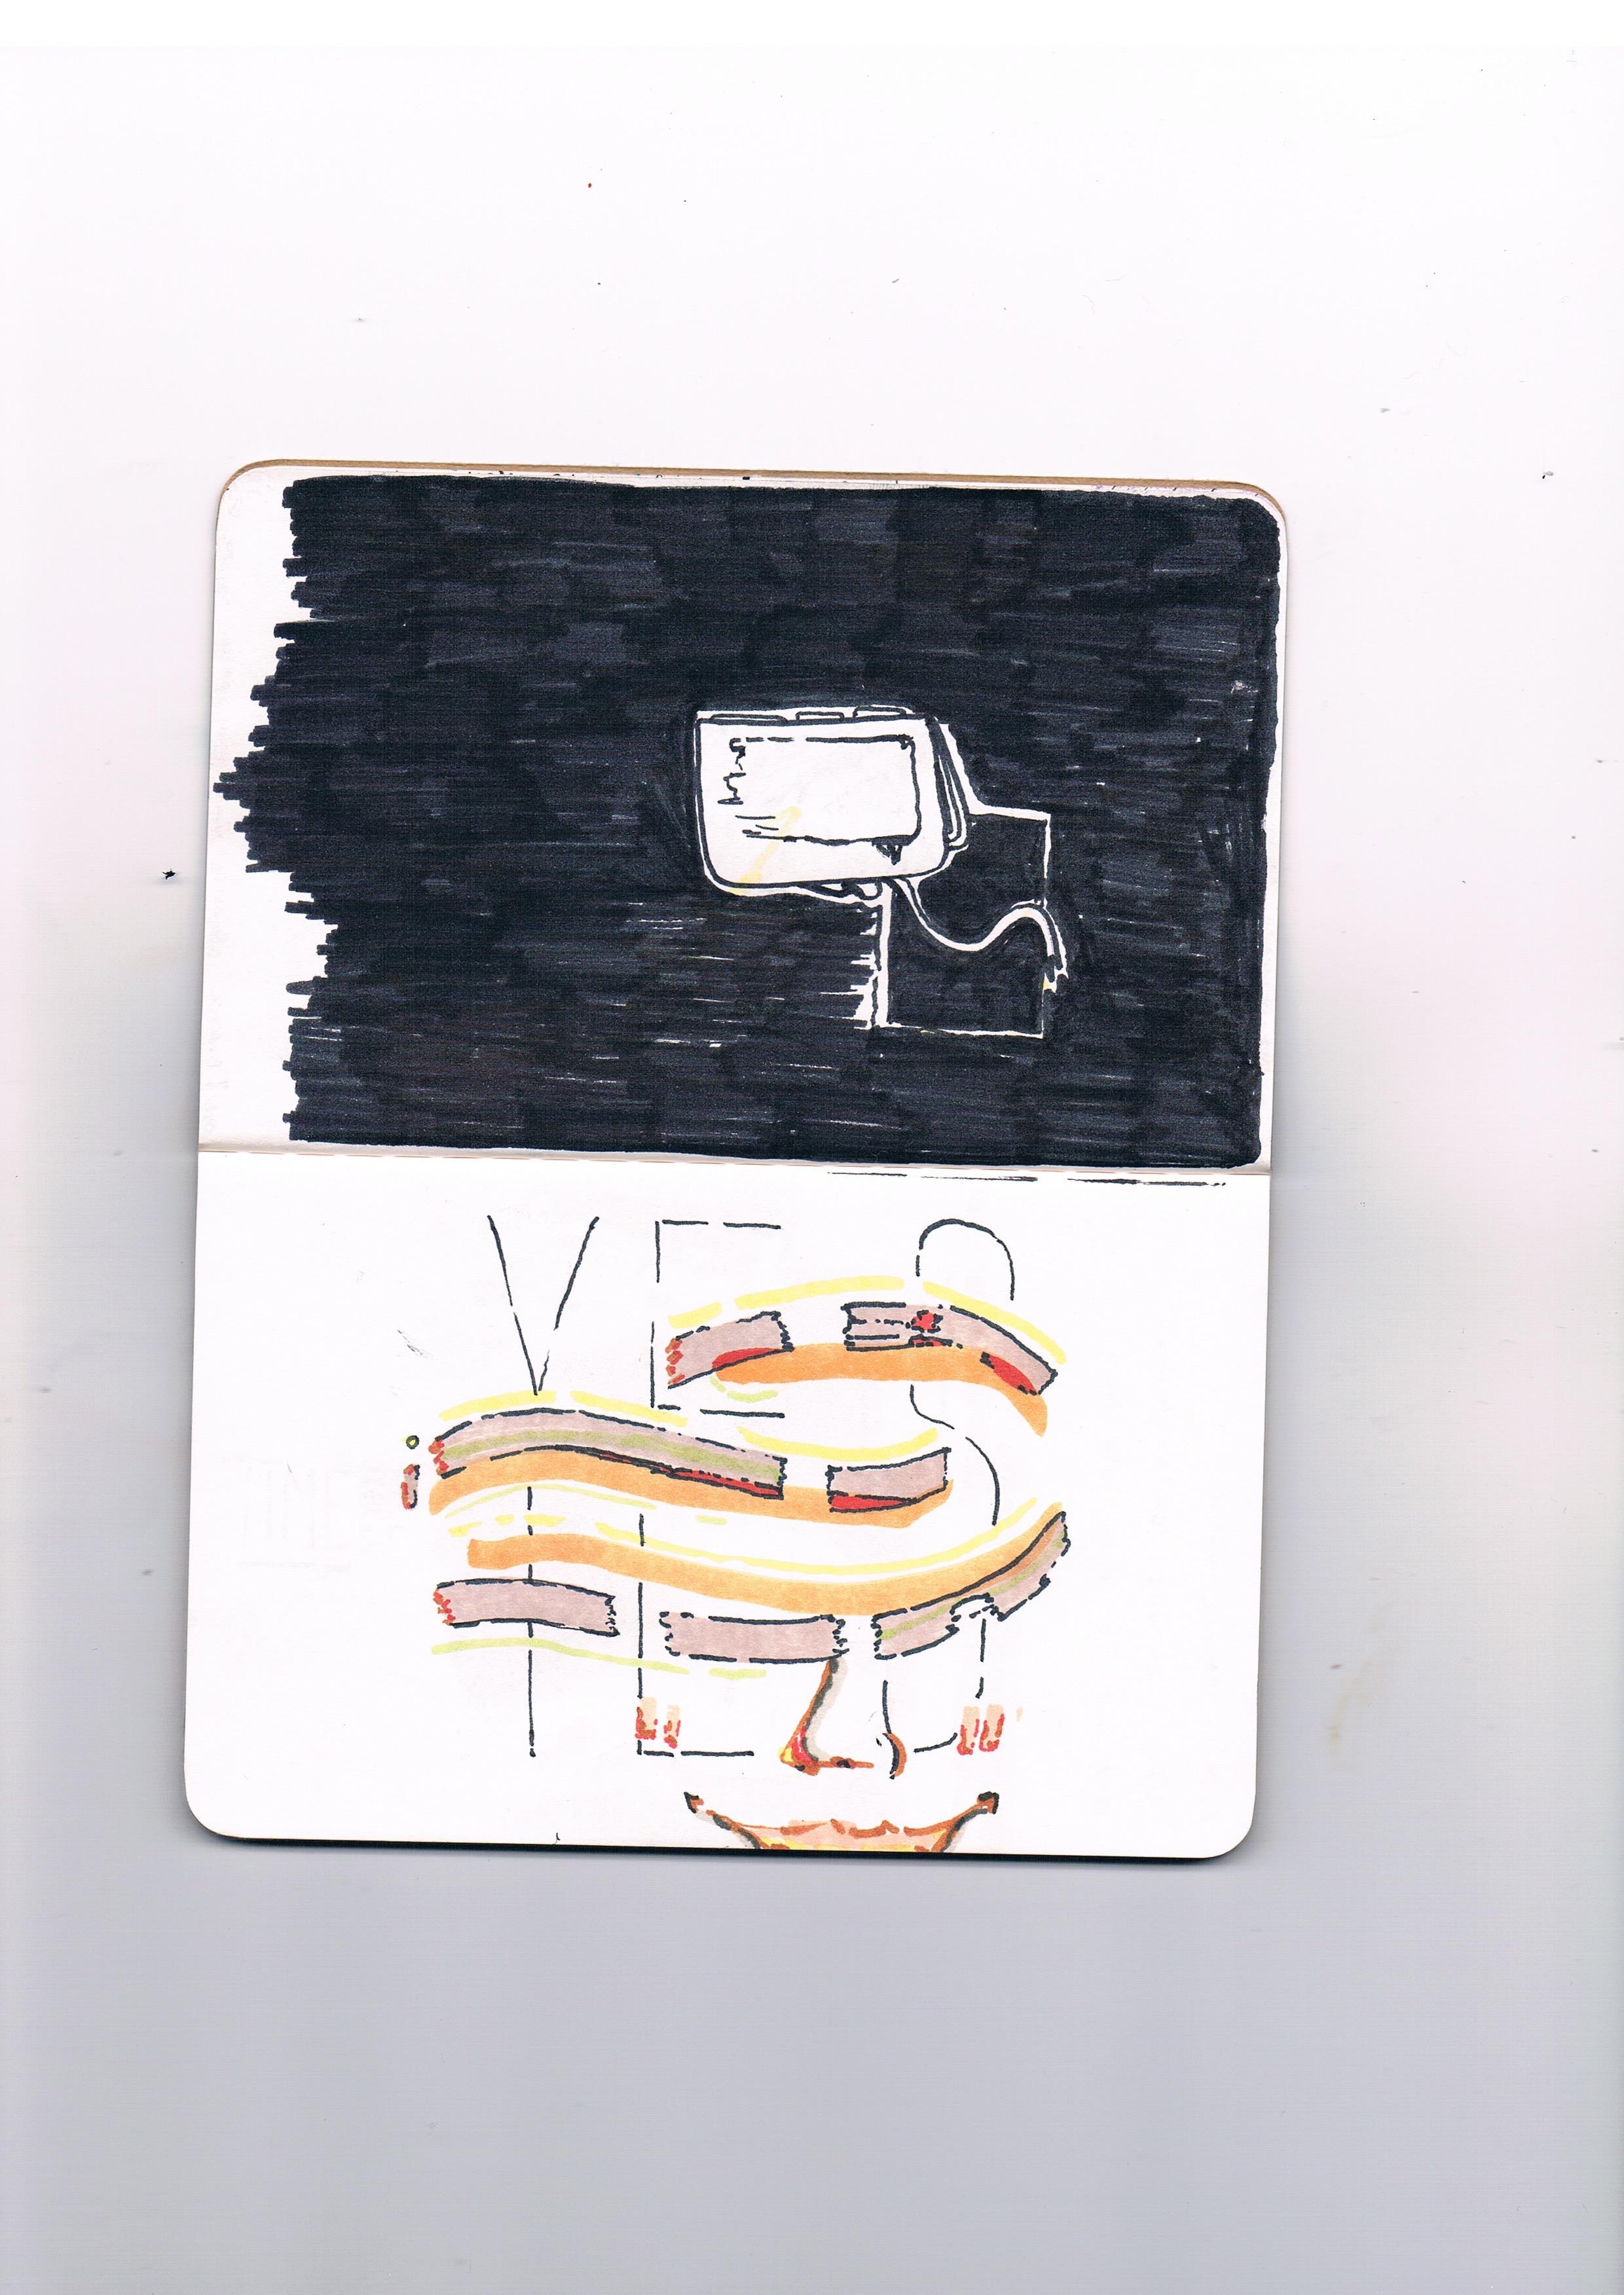 Sketchbook Project 4